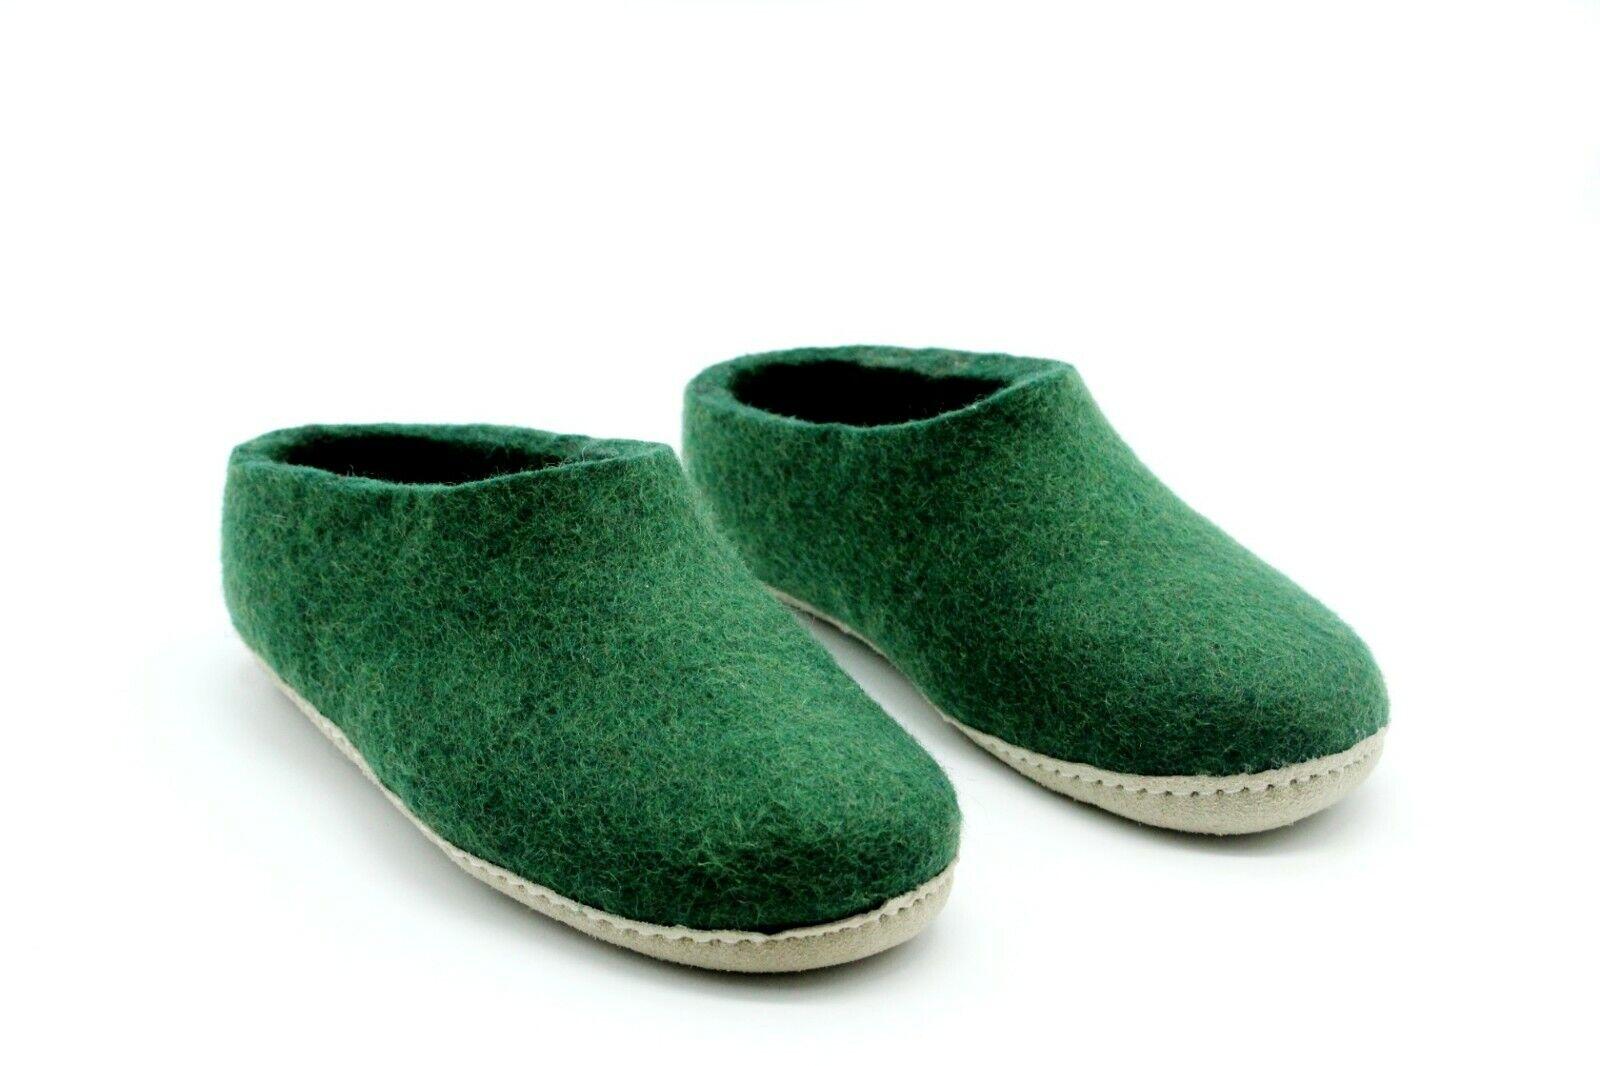 Handmade Felt Slipper - Made From Pure NewZealand Wool - Unisex slipper - Nepal